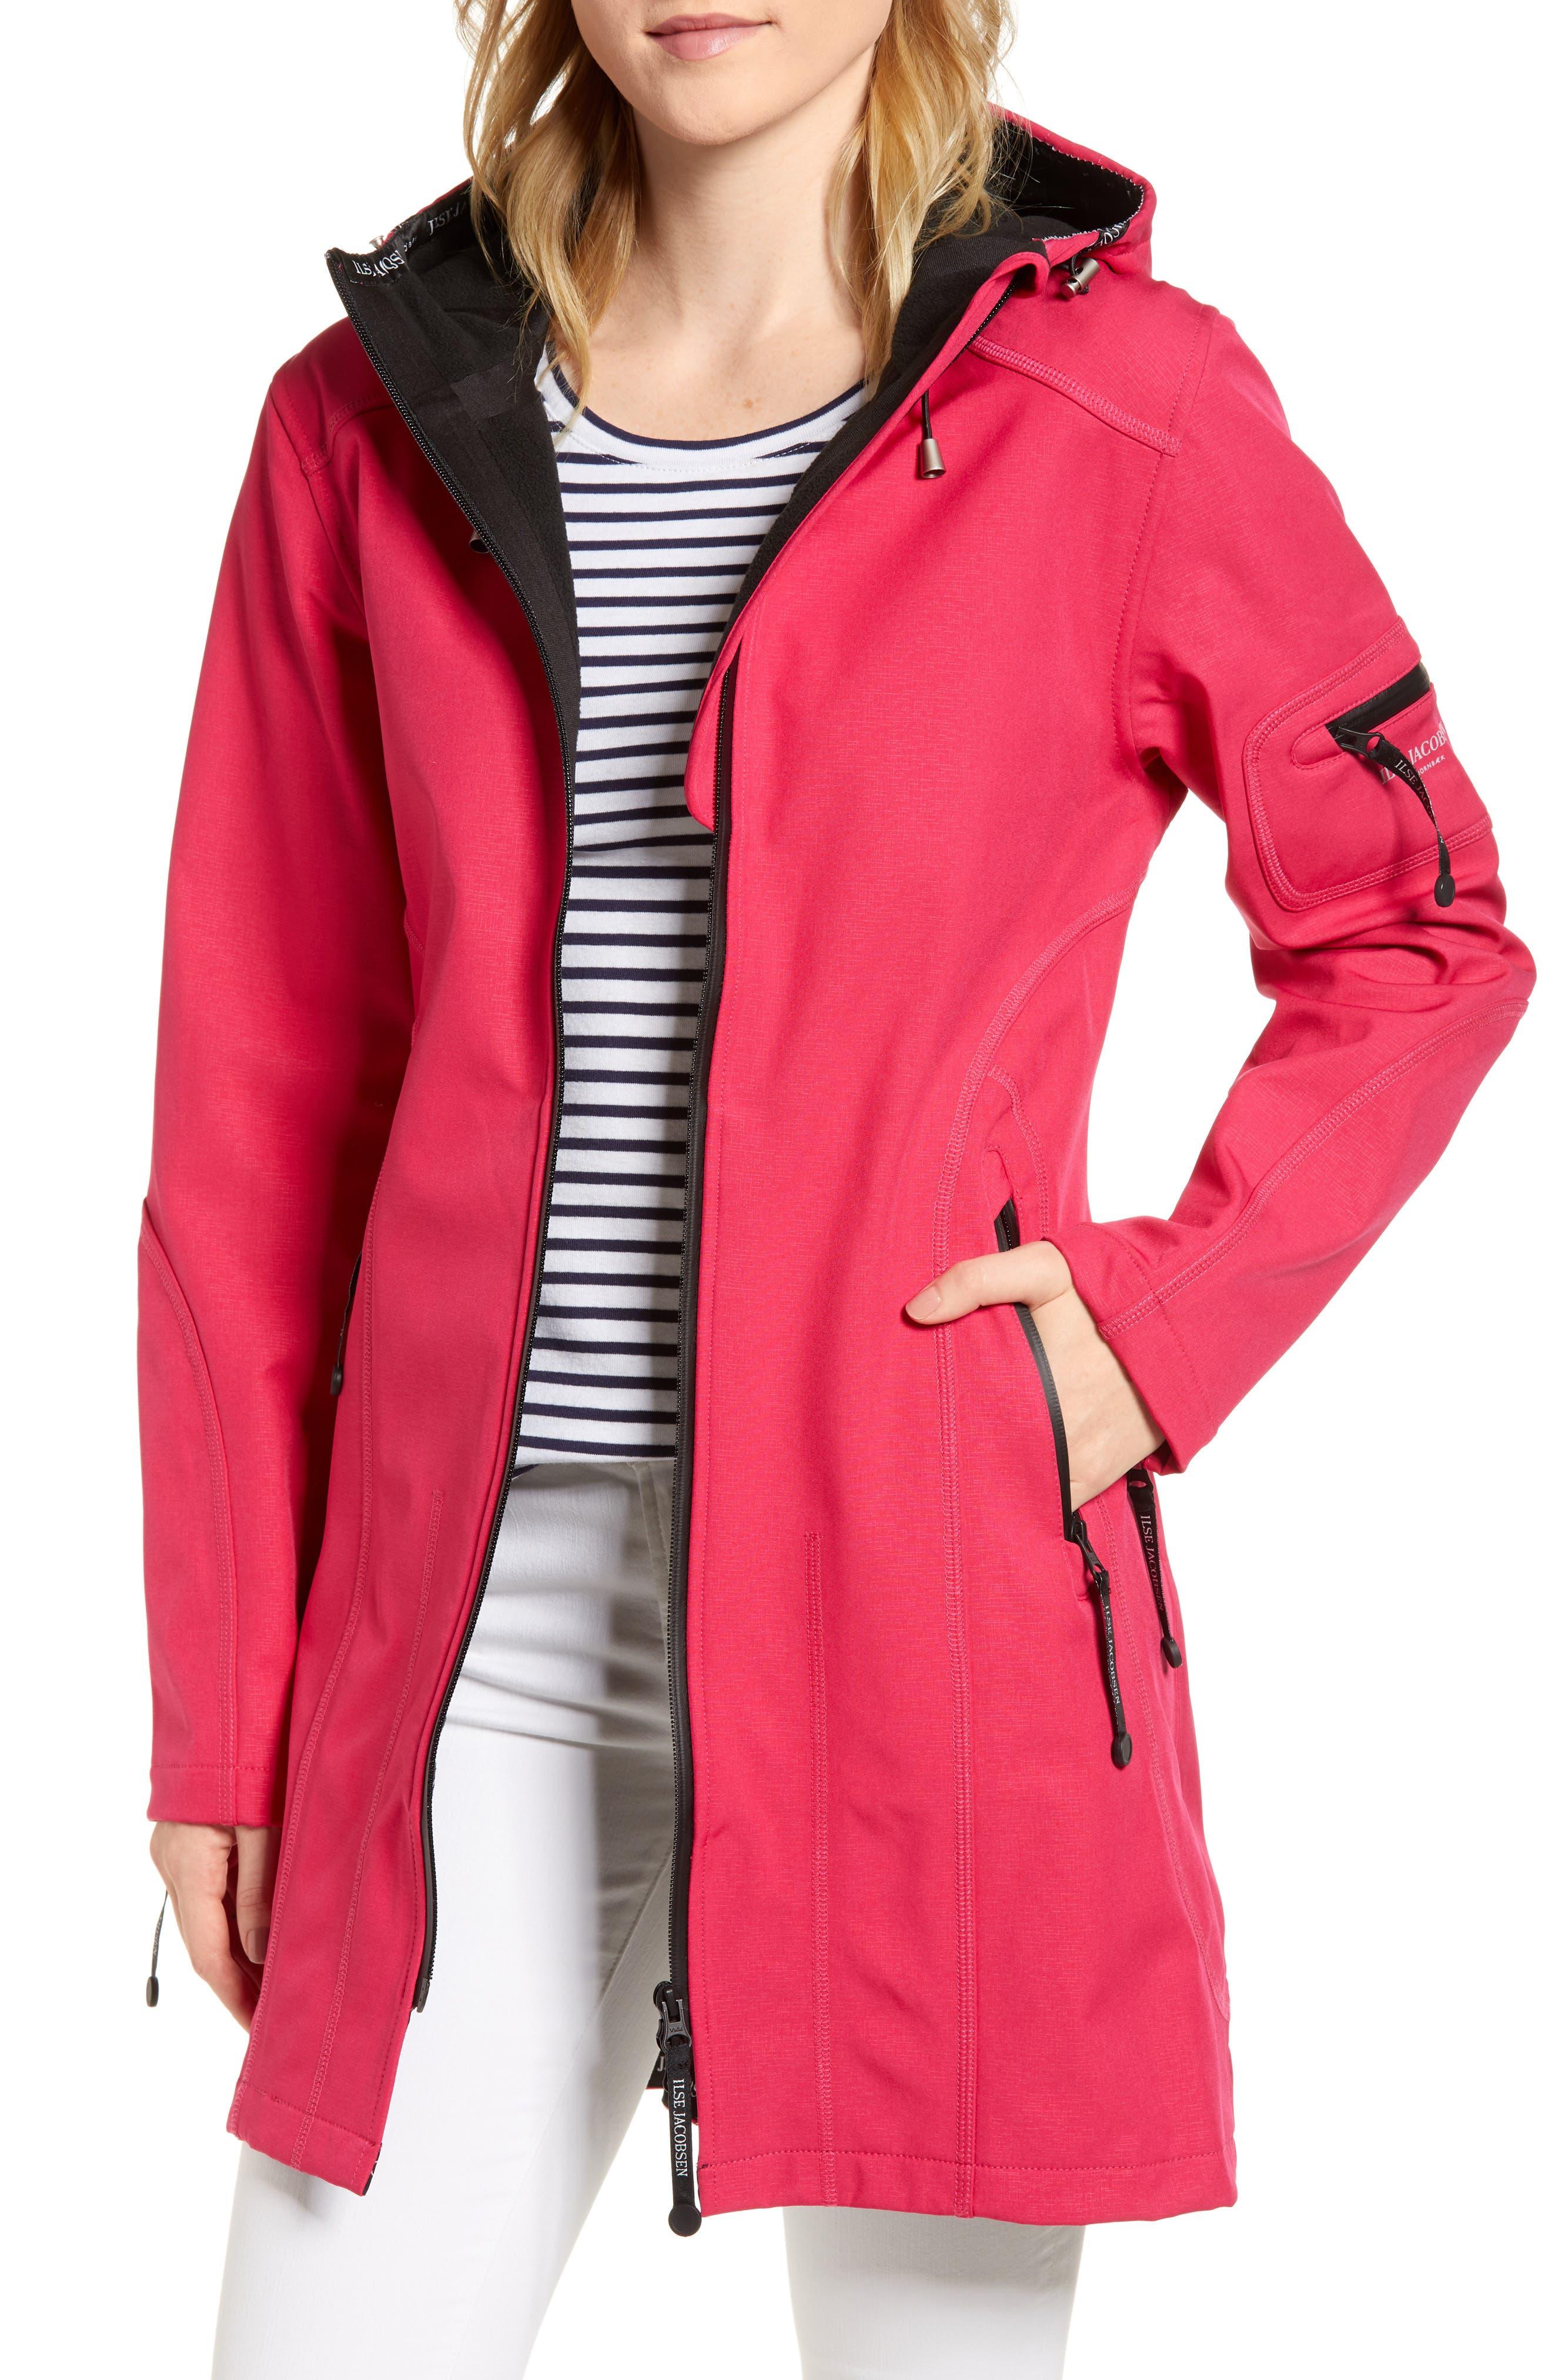 Rain 7 Hooded Water Resistant Coat,                             Main thumbnail 1, color,                             Warm Pink